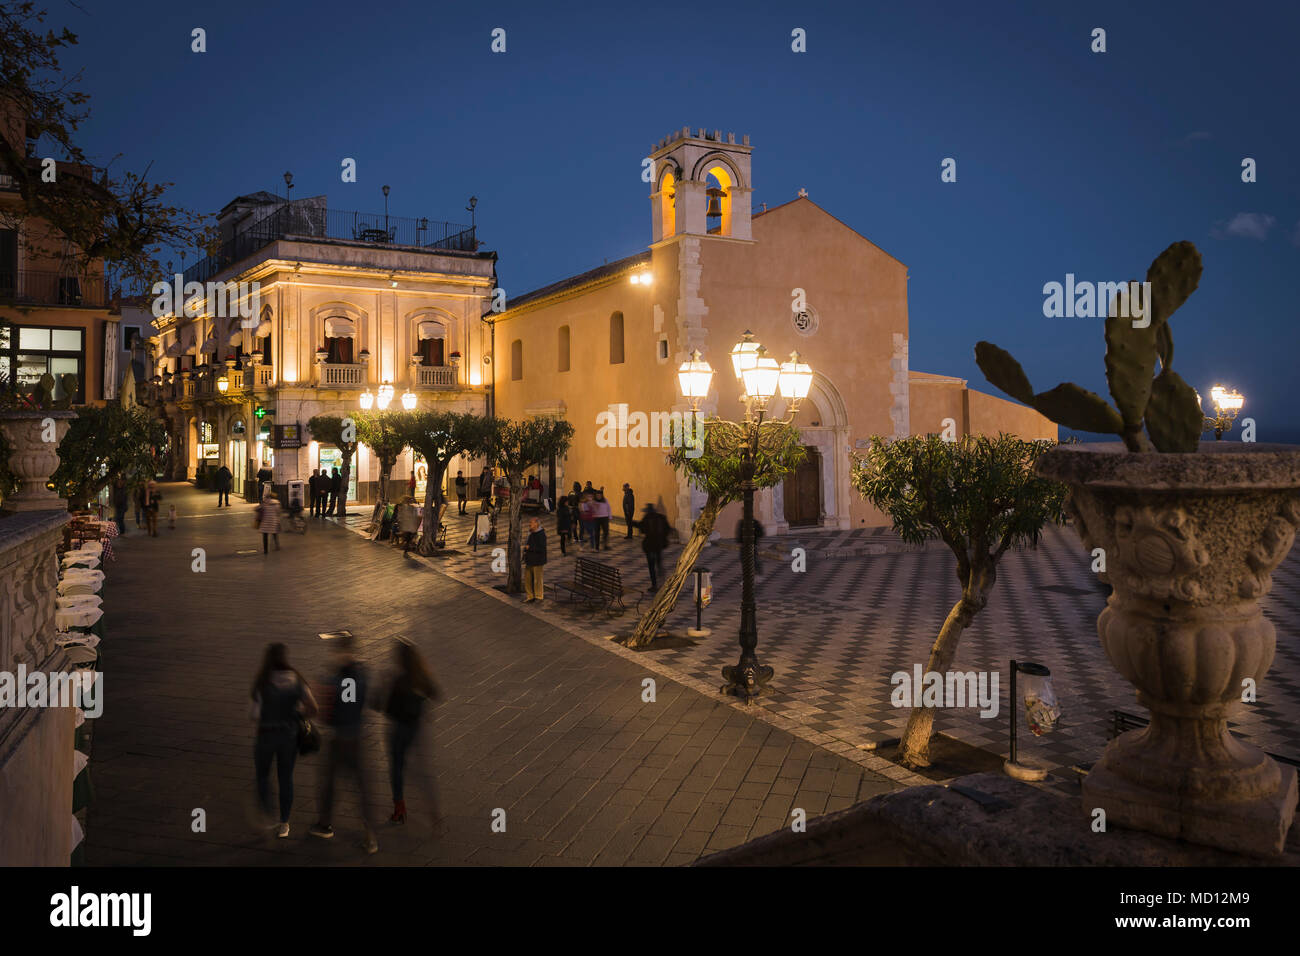 Piazza IX Apeile square y Corso Umberto I en Taormina, Sicilia. Imagen De Stock